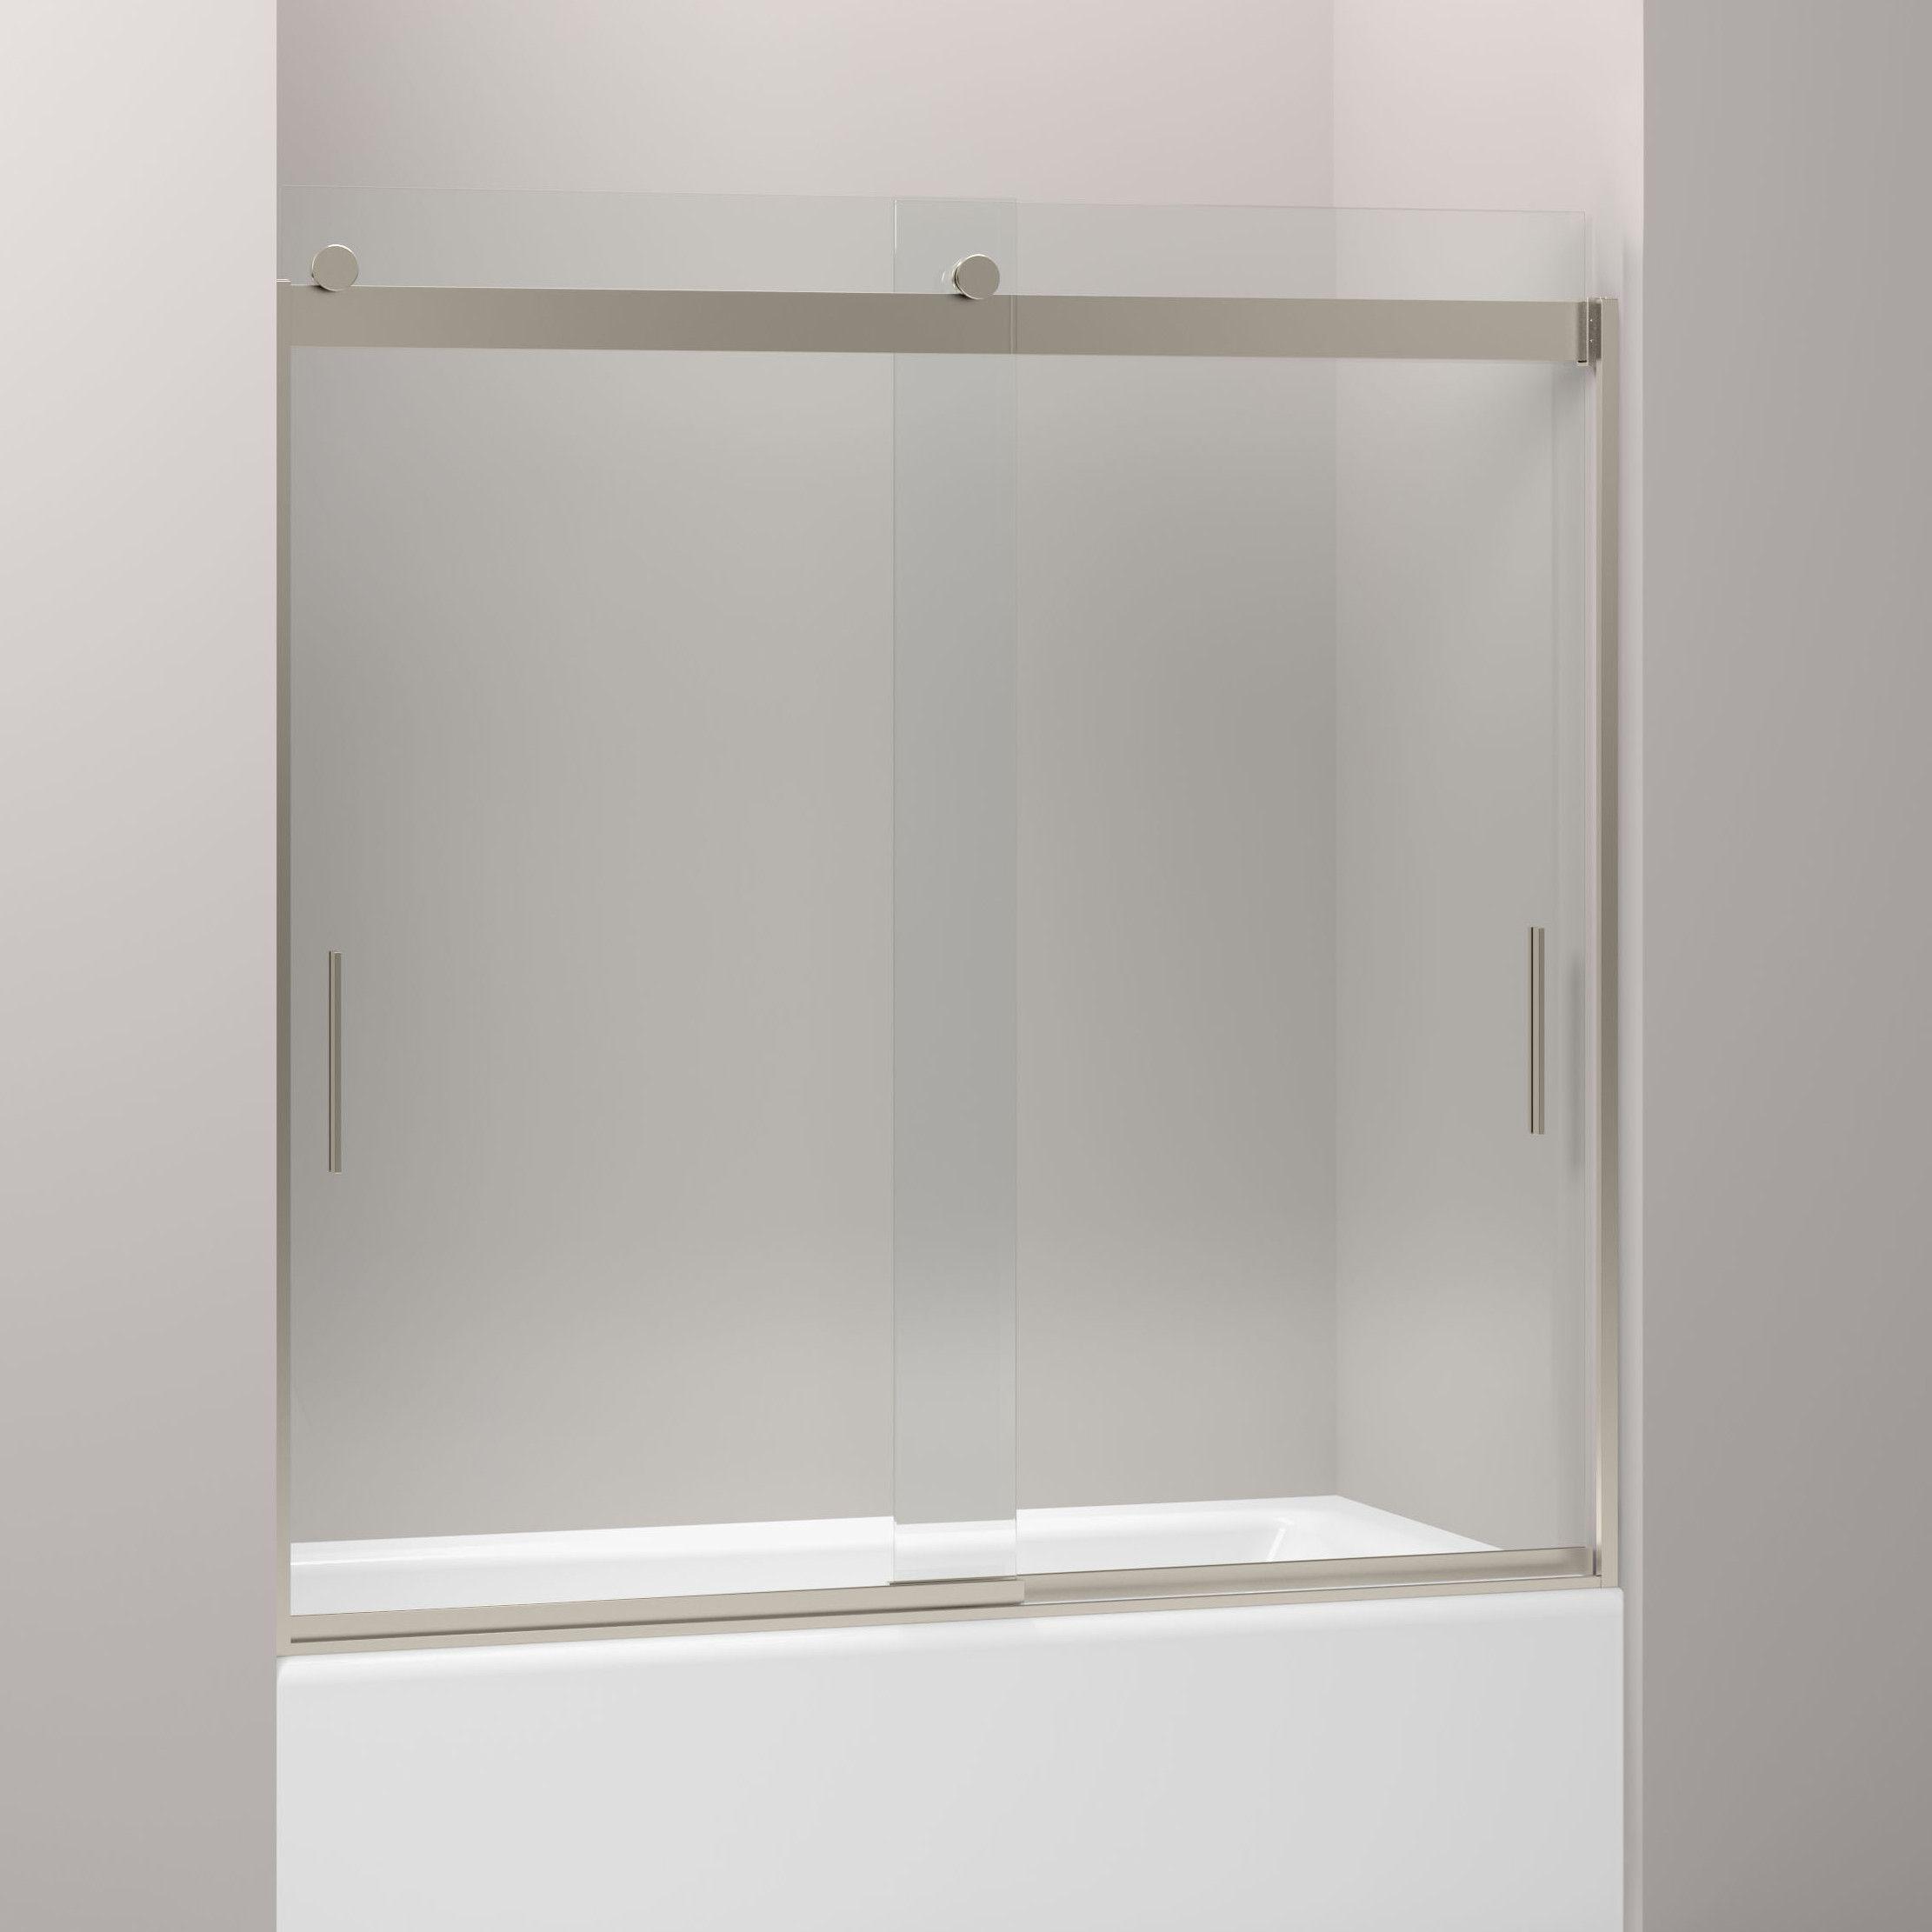 Kohler Levity 5975 X 57 Sliding Bath Door